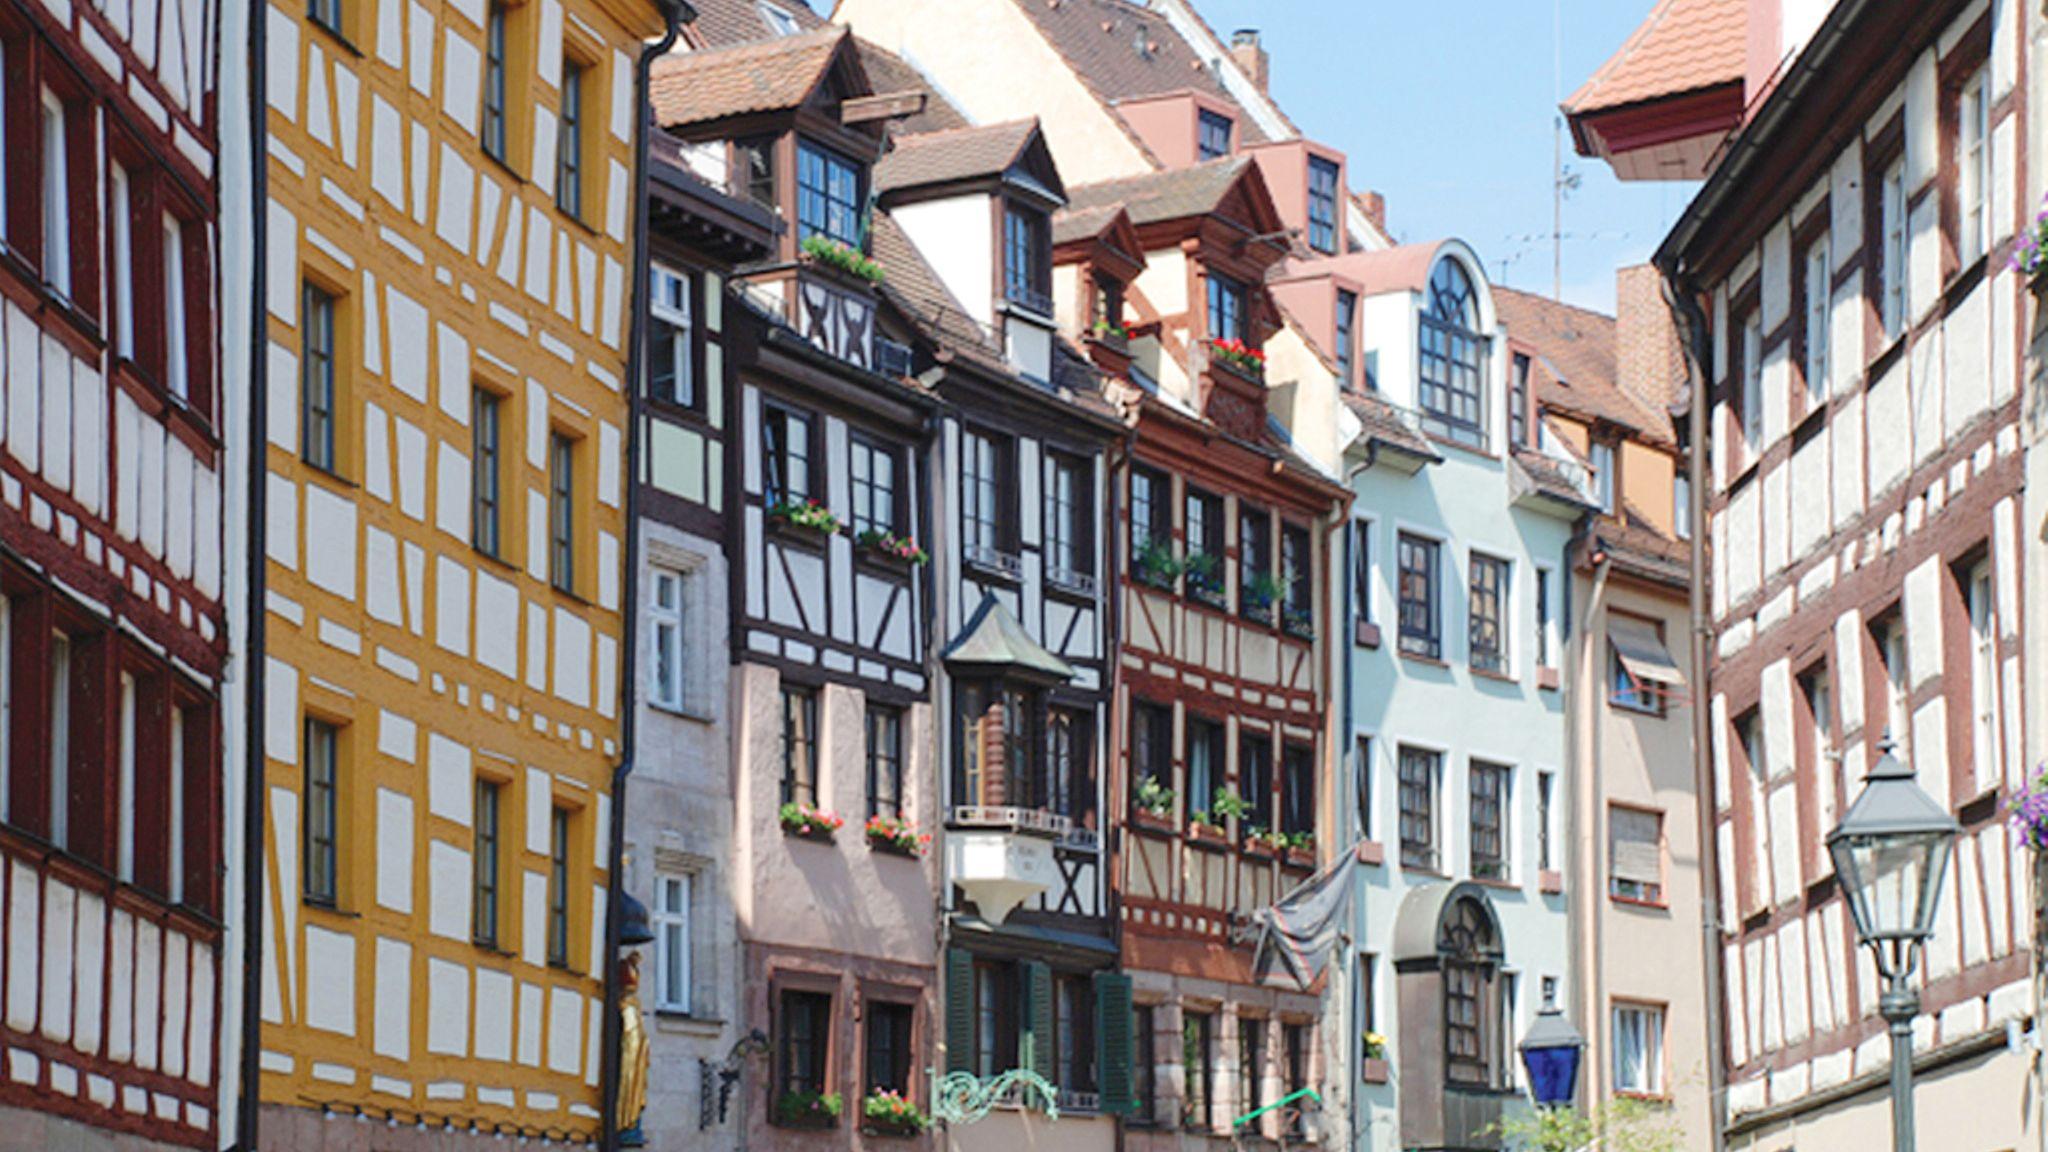 Nuremberg & Rothenburg Full-Day Tour